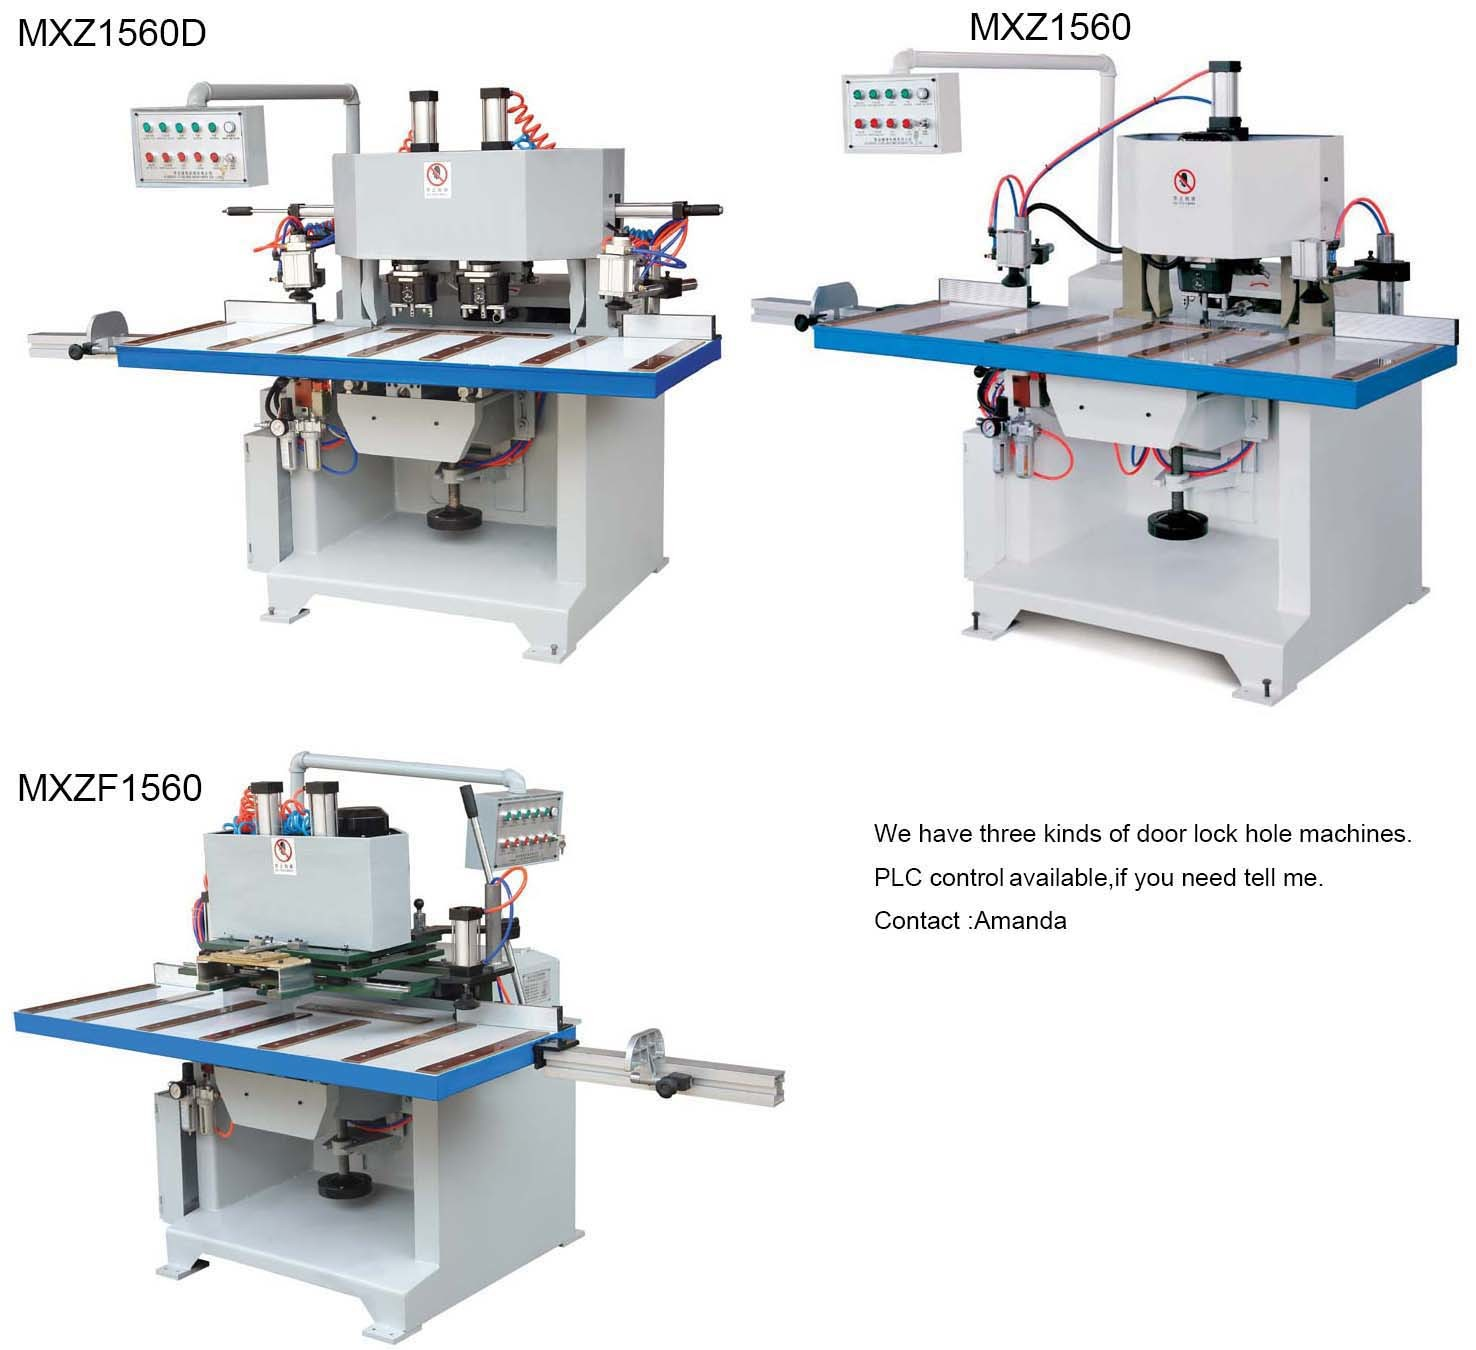 Quality CNC Router Machines & CNC Wood Lathes Manufacturer